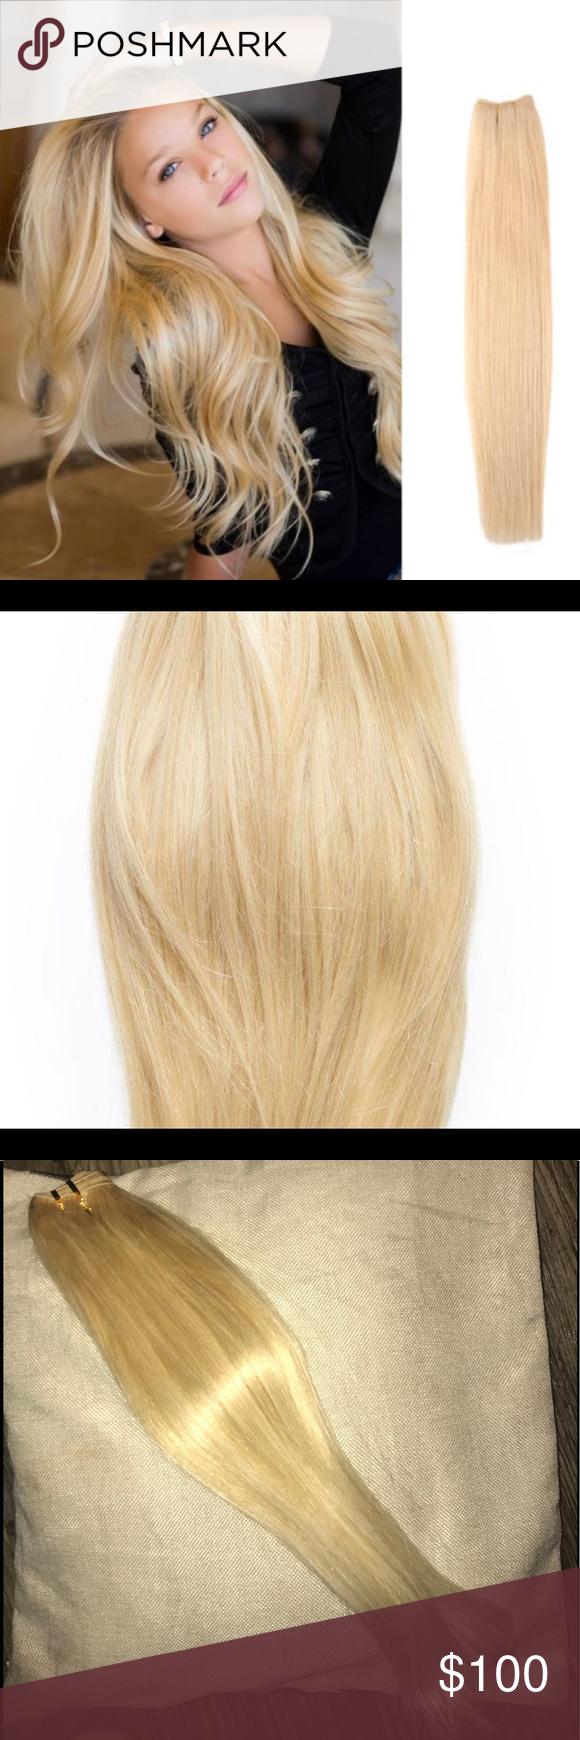 Best Quality Remy Virgin Hair Platinum Blonde Nwt Best Quality